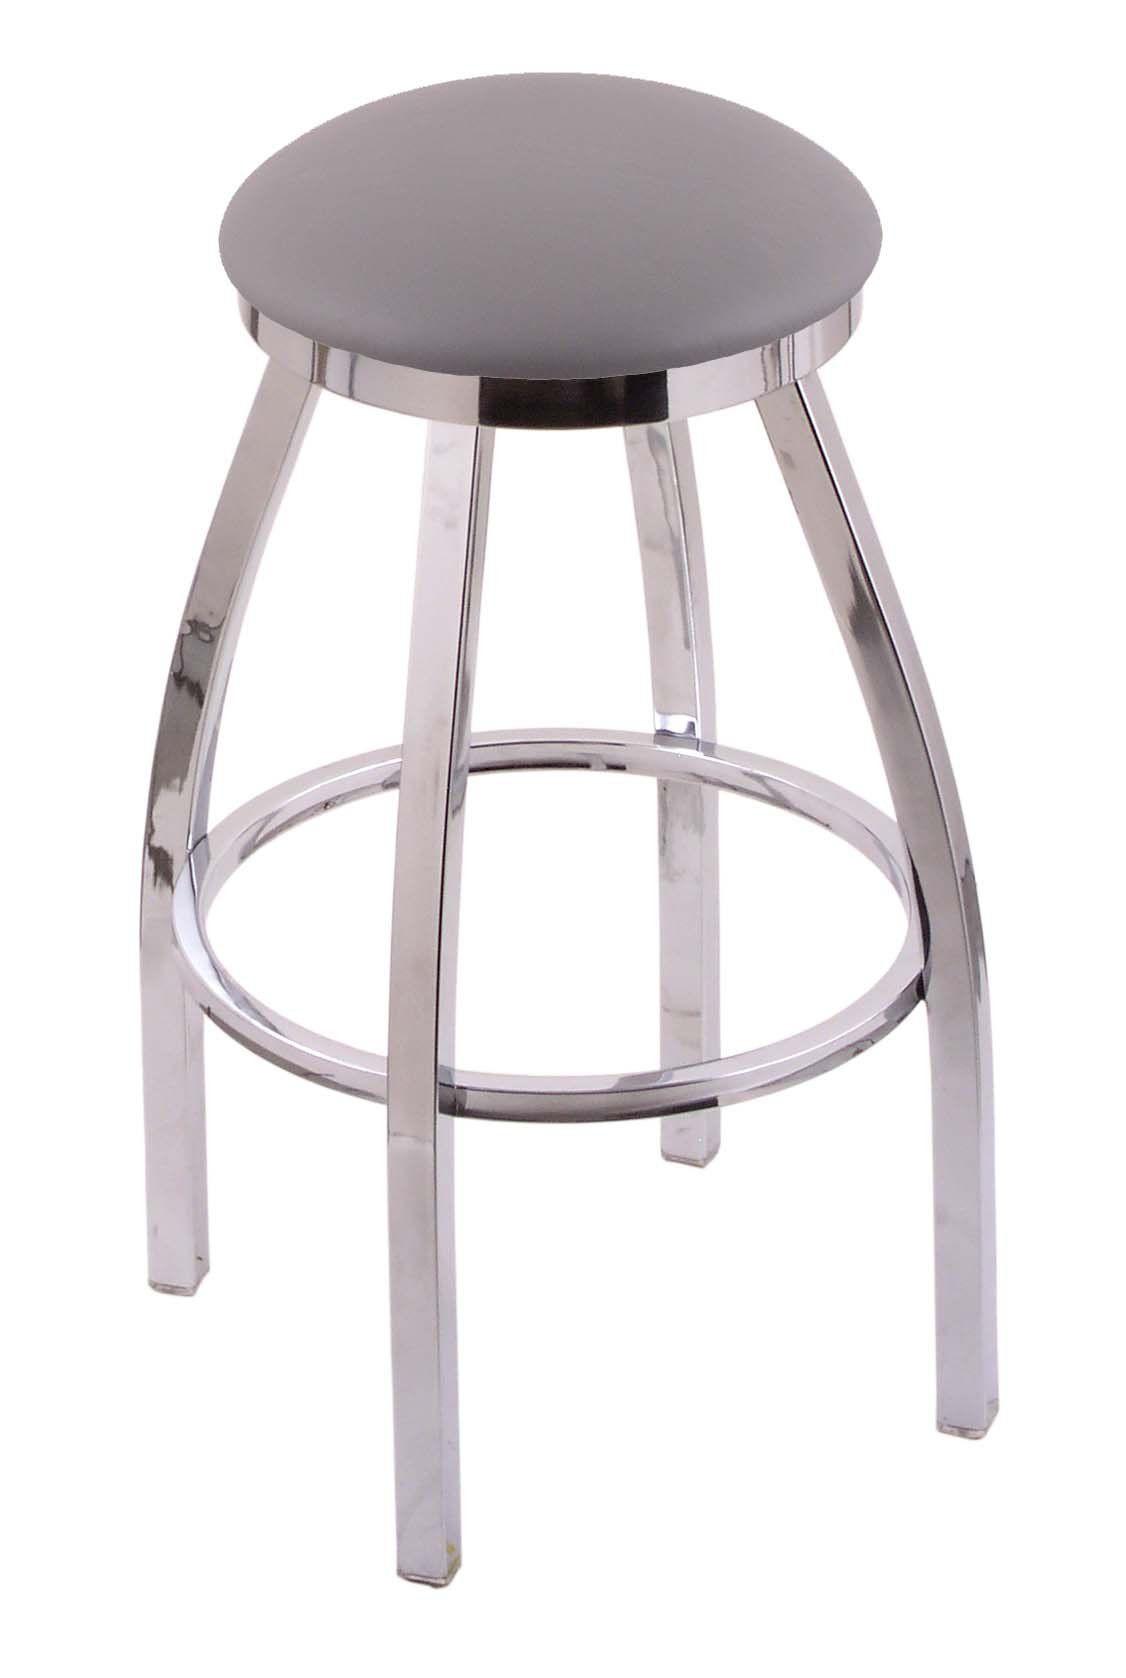 Holland Bar Stool Co 802 Misha 36 Extra Tall Bar Stool With Chrome Finish And Swivel Seat Allante Medium Grey Bar Stools Holland Bar Stool 30 Inch Bar Stools 36 seat height bar stools